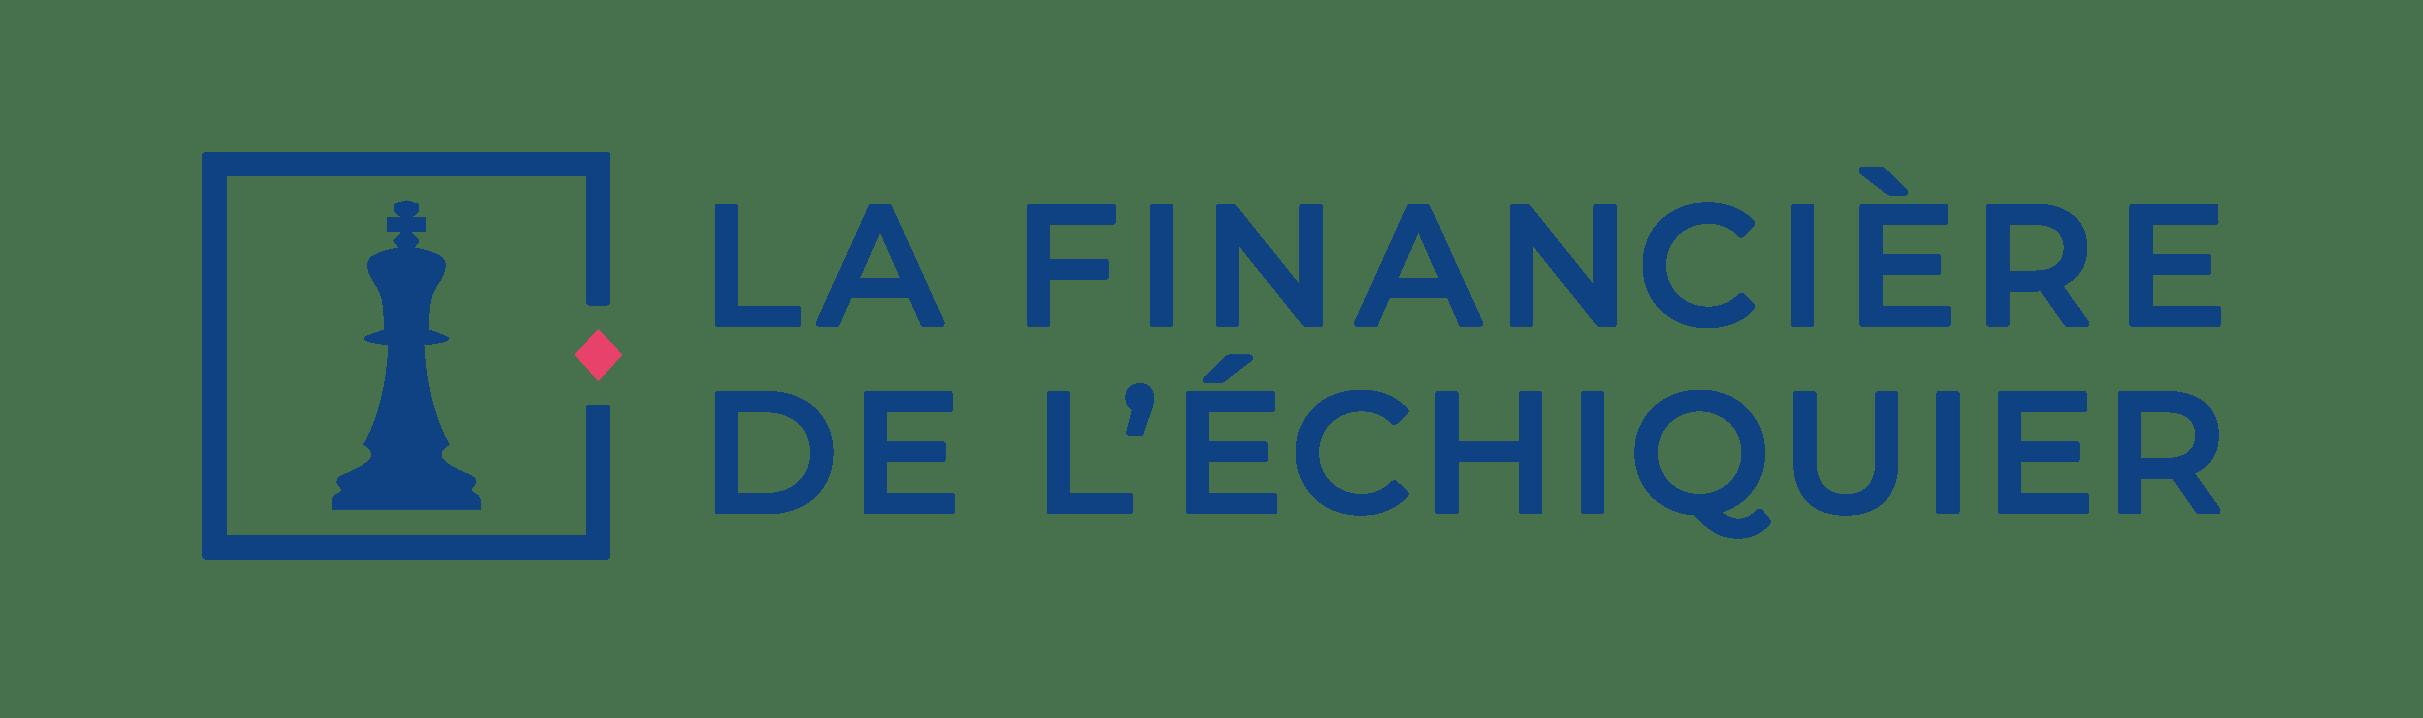 Logo Lafinancieredelechiquier Quadri Web